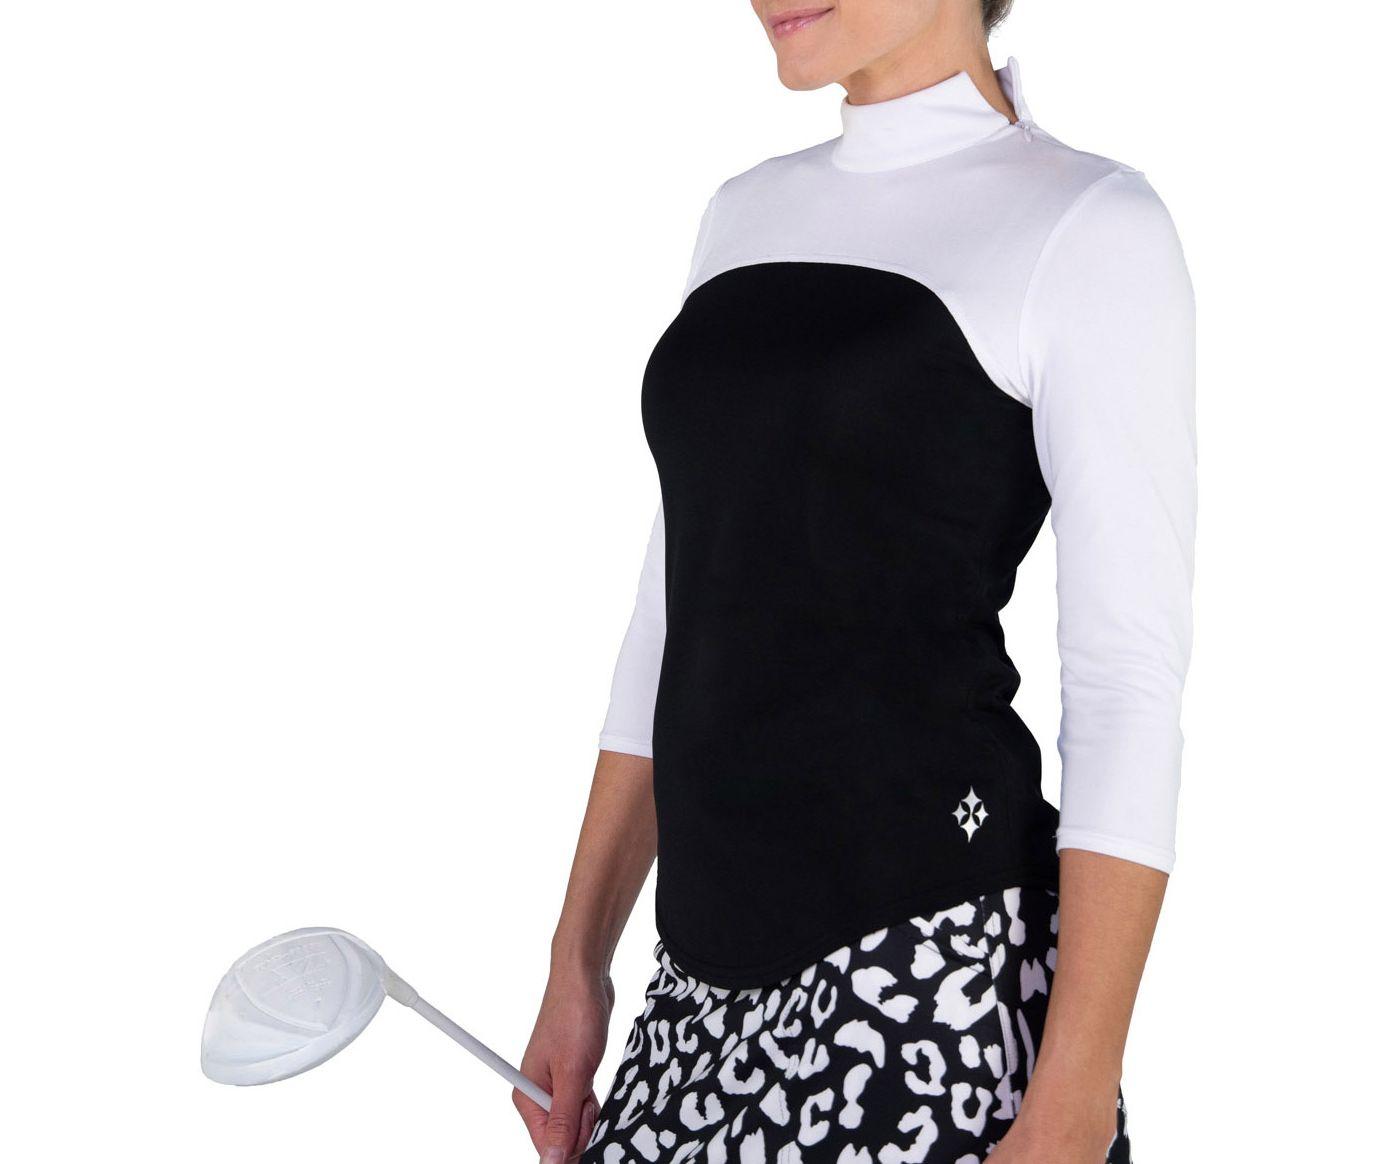 Jofit Women's Colorblock Mock Neck ¾ Sleeve Golf Top